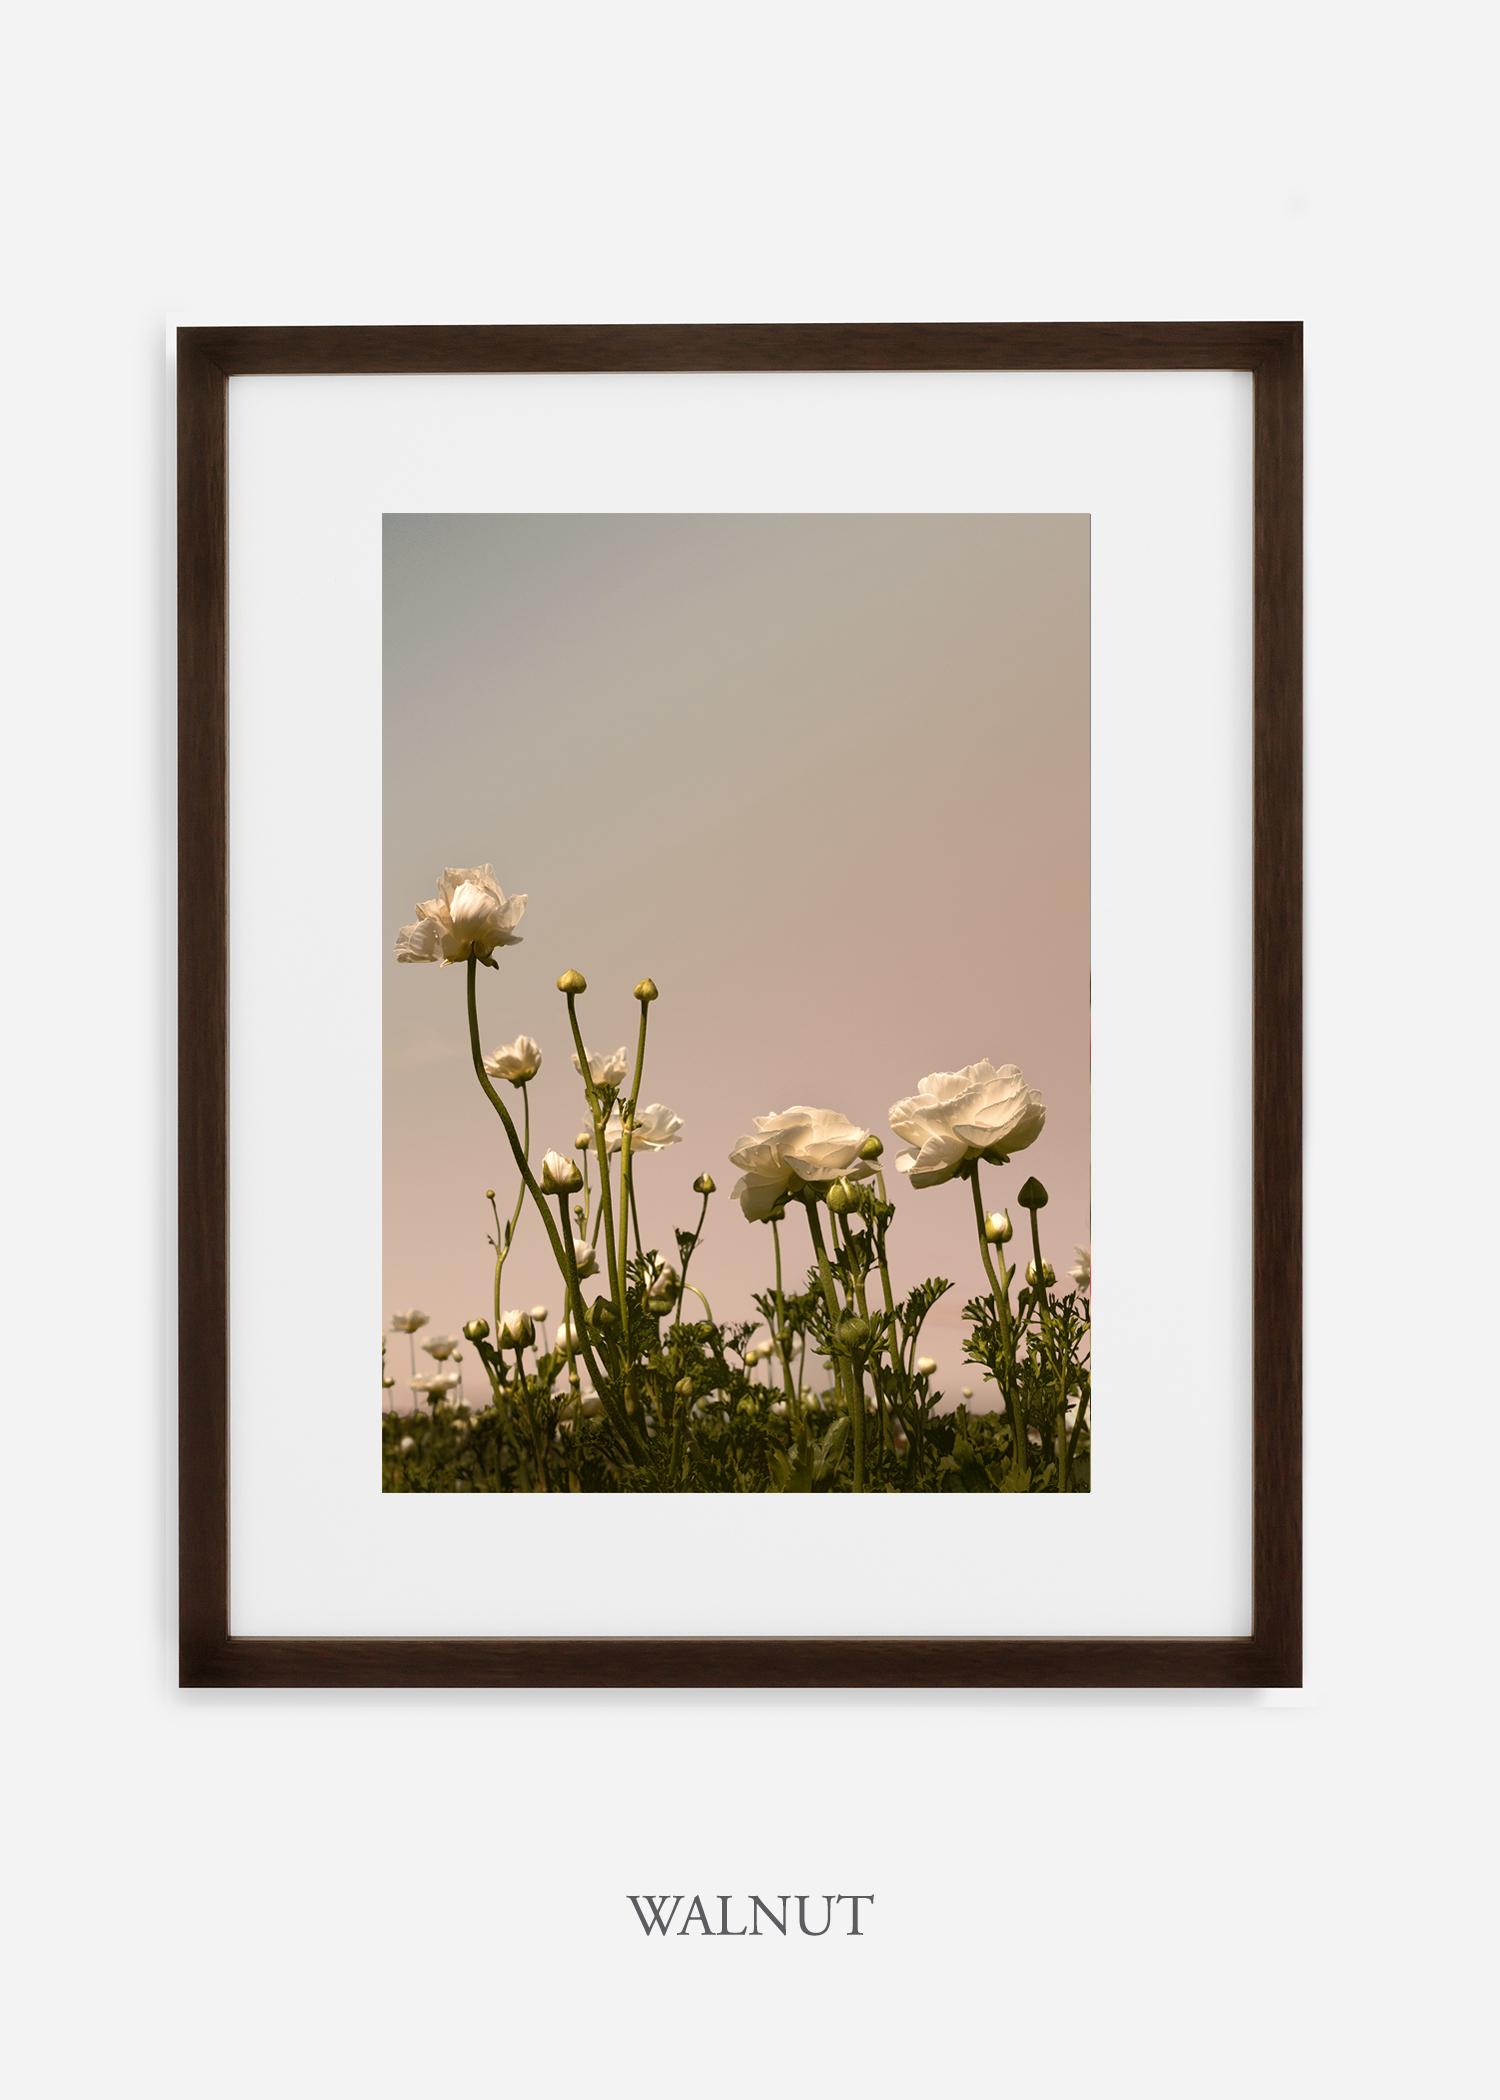 FloraNo.7-walnut-frame_mat-interiordesign-botanicalprint-art.jpg